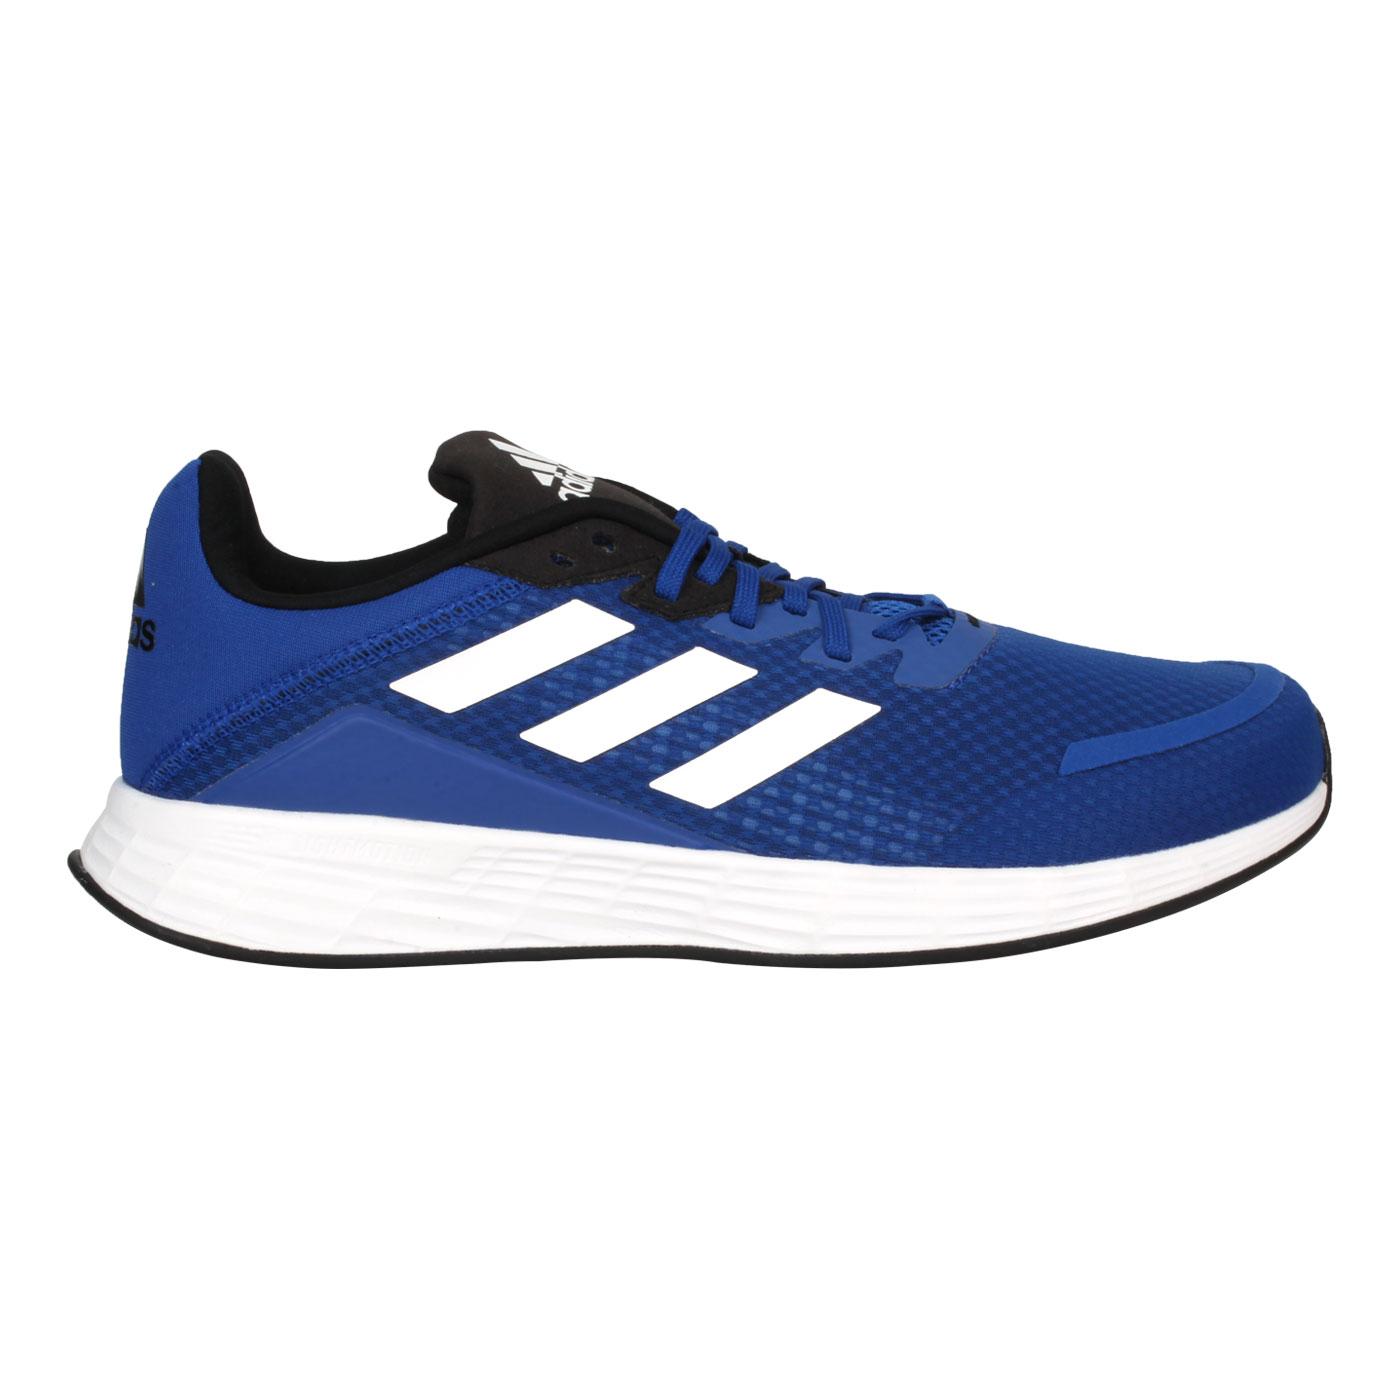 ADIDAS 男款慢跑鞋  @DURAMO SL@FW8678